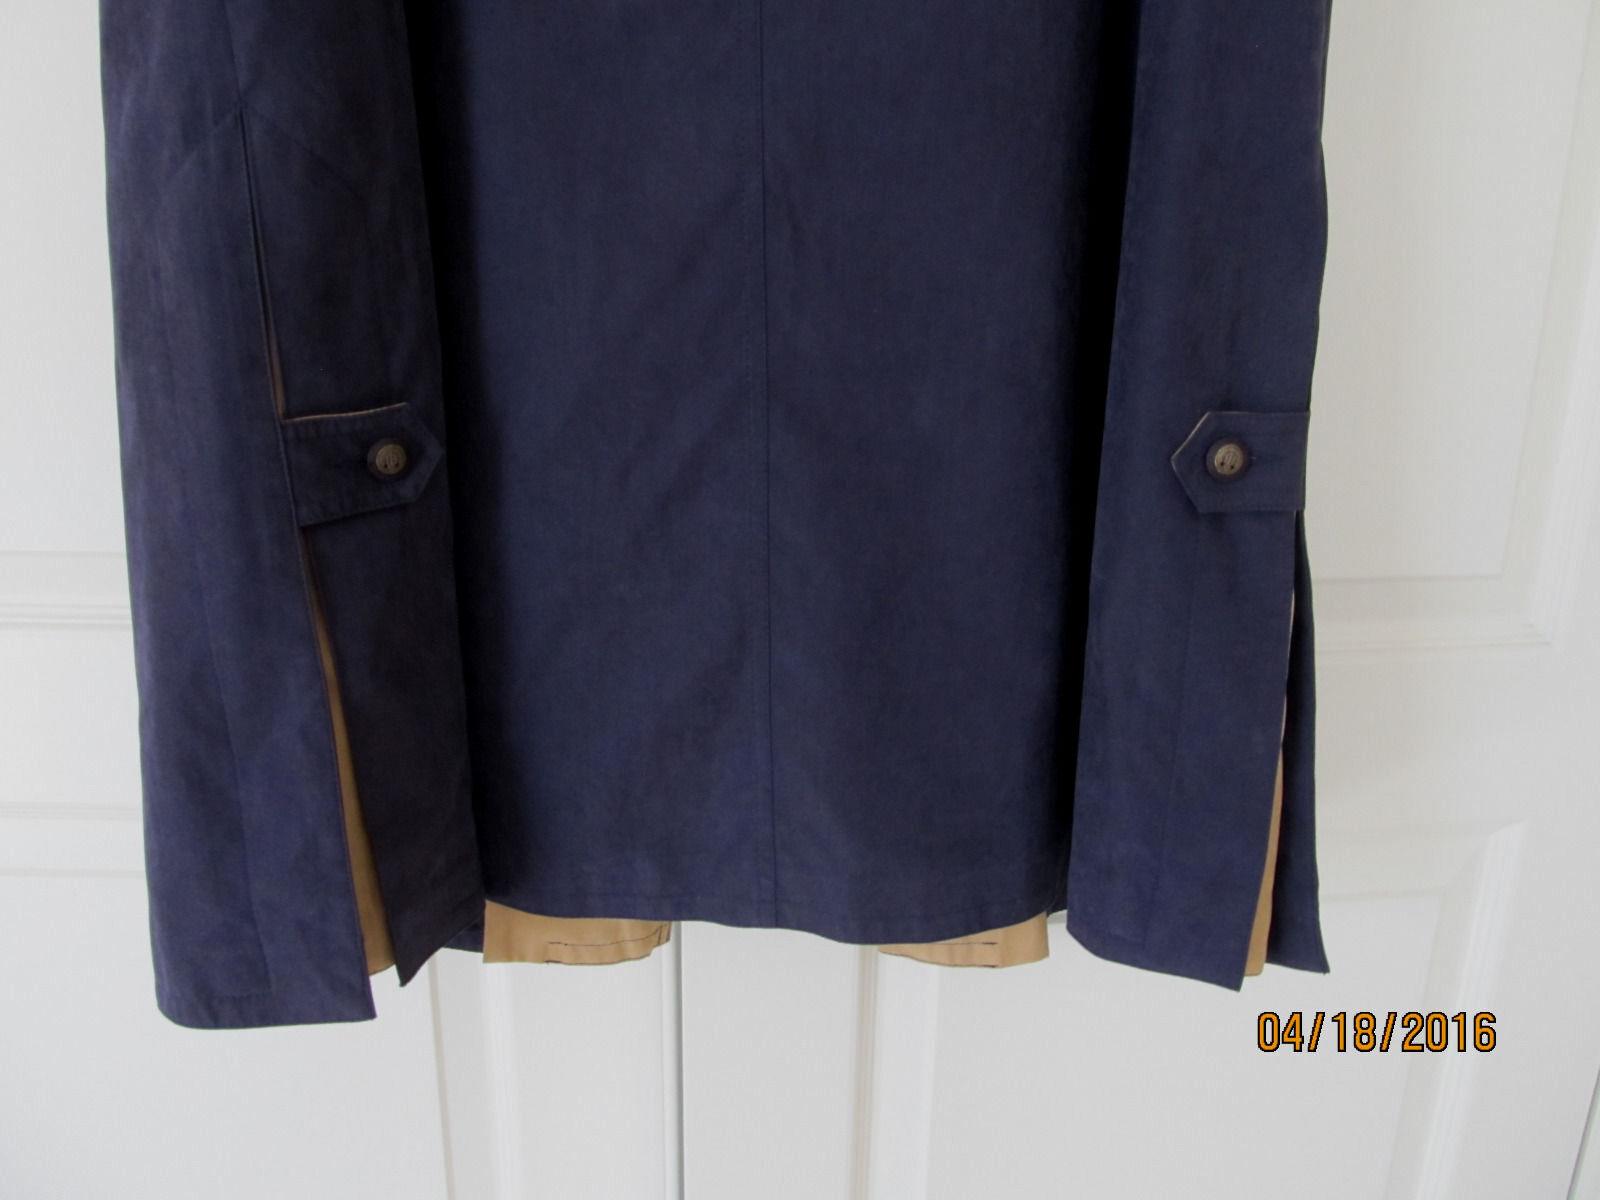 NWOT Luba Navy Tan Multi Ankle-length Front Front Front Button Raincoat Women 6 (S-M) 641cf4